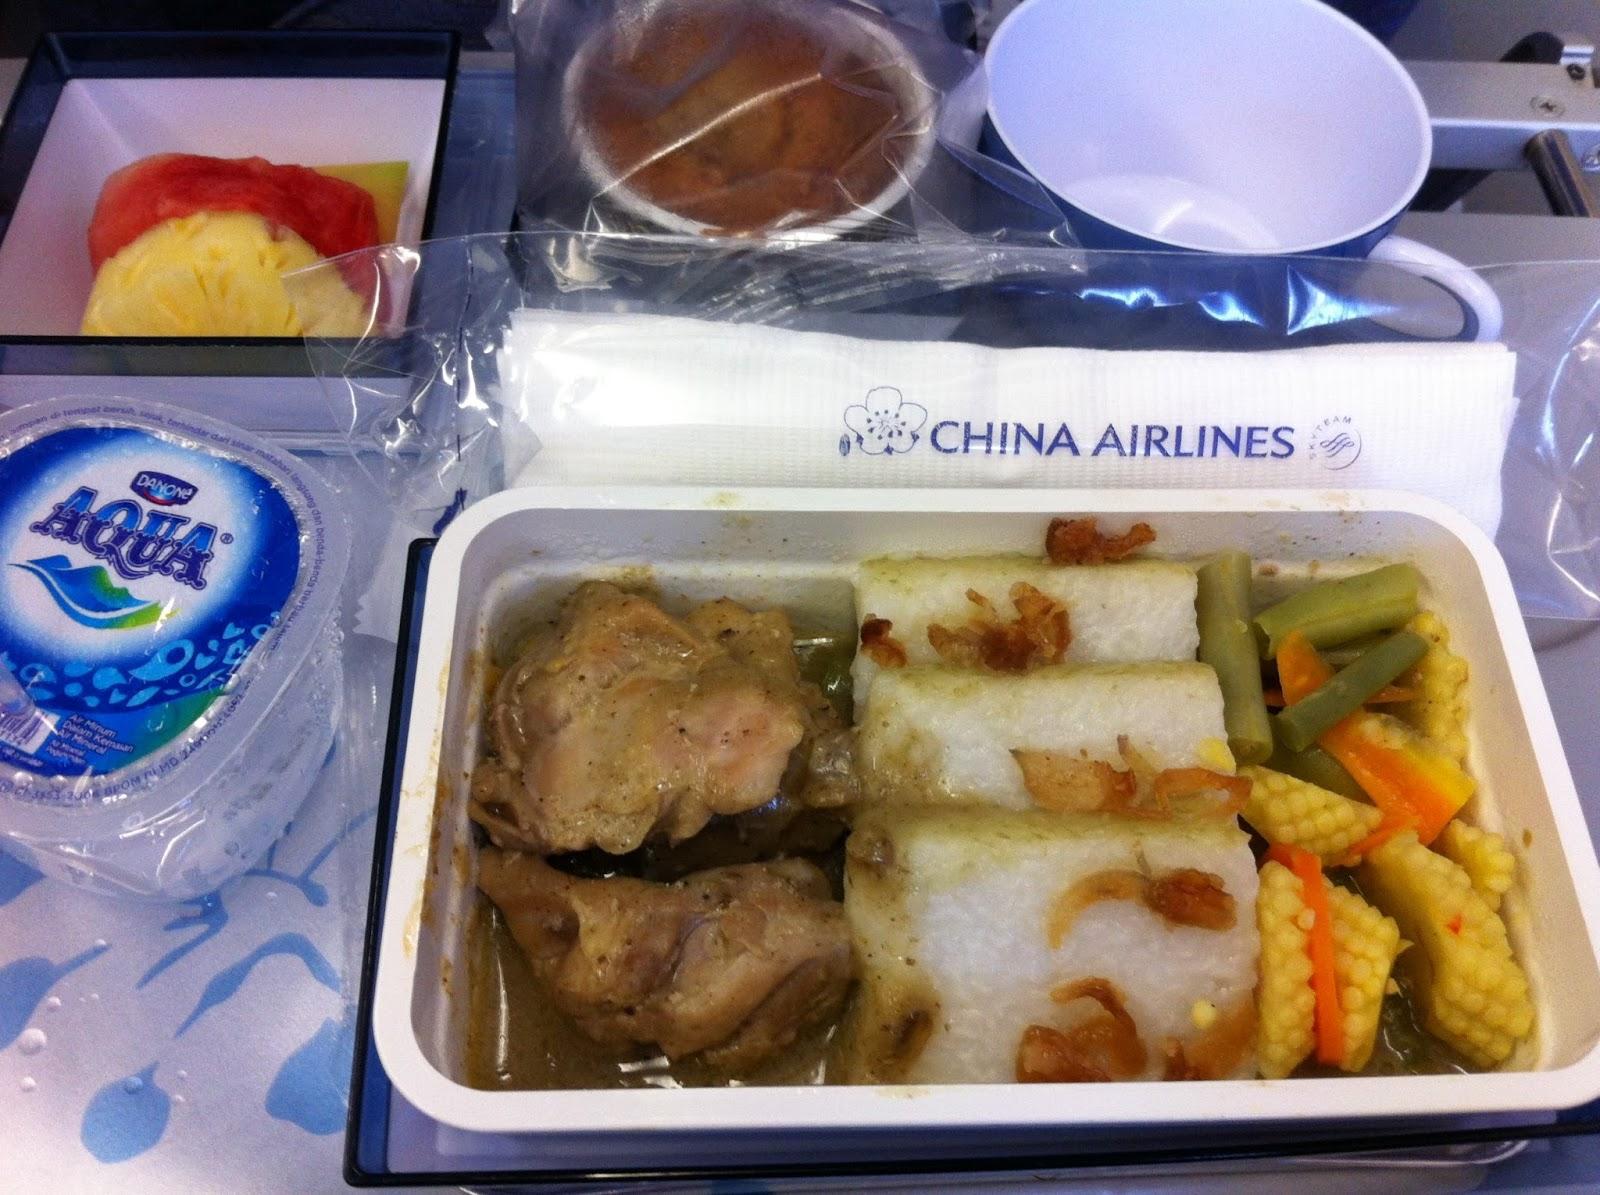 Pengalaman Naik China Airlines Rute Surabaya Singapura